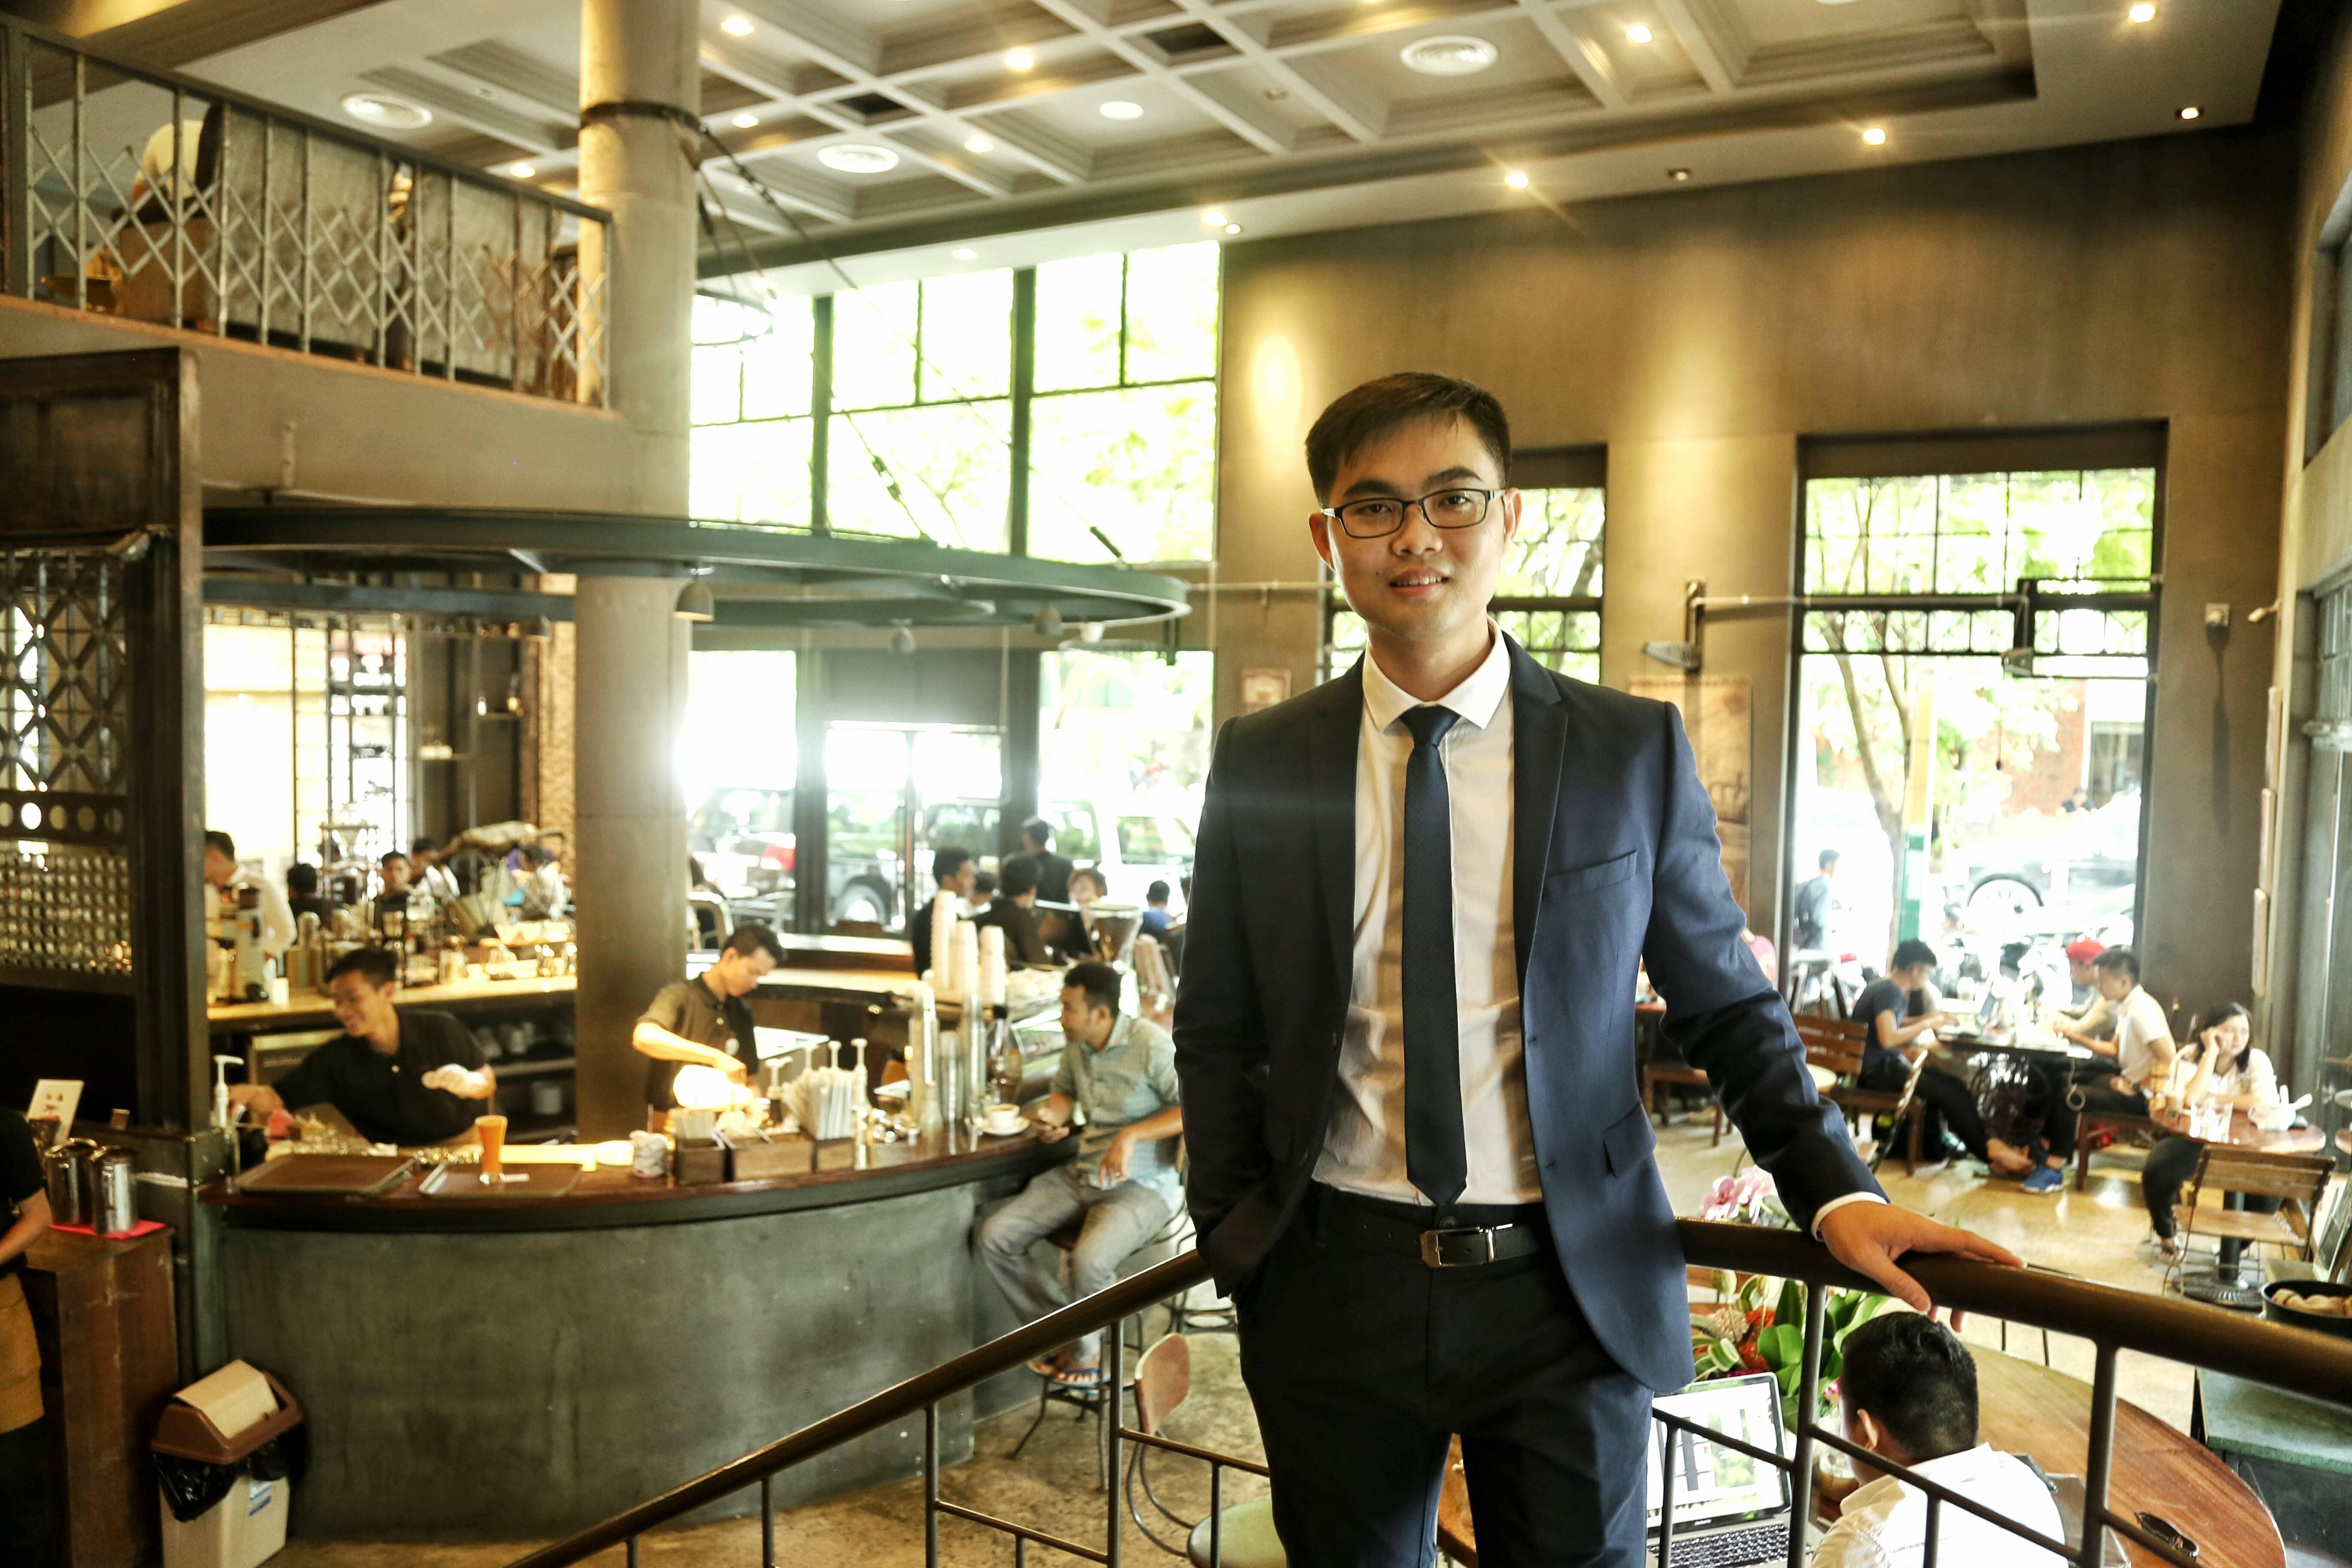 Chang Bunleang